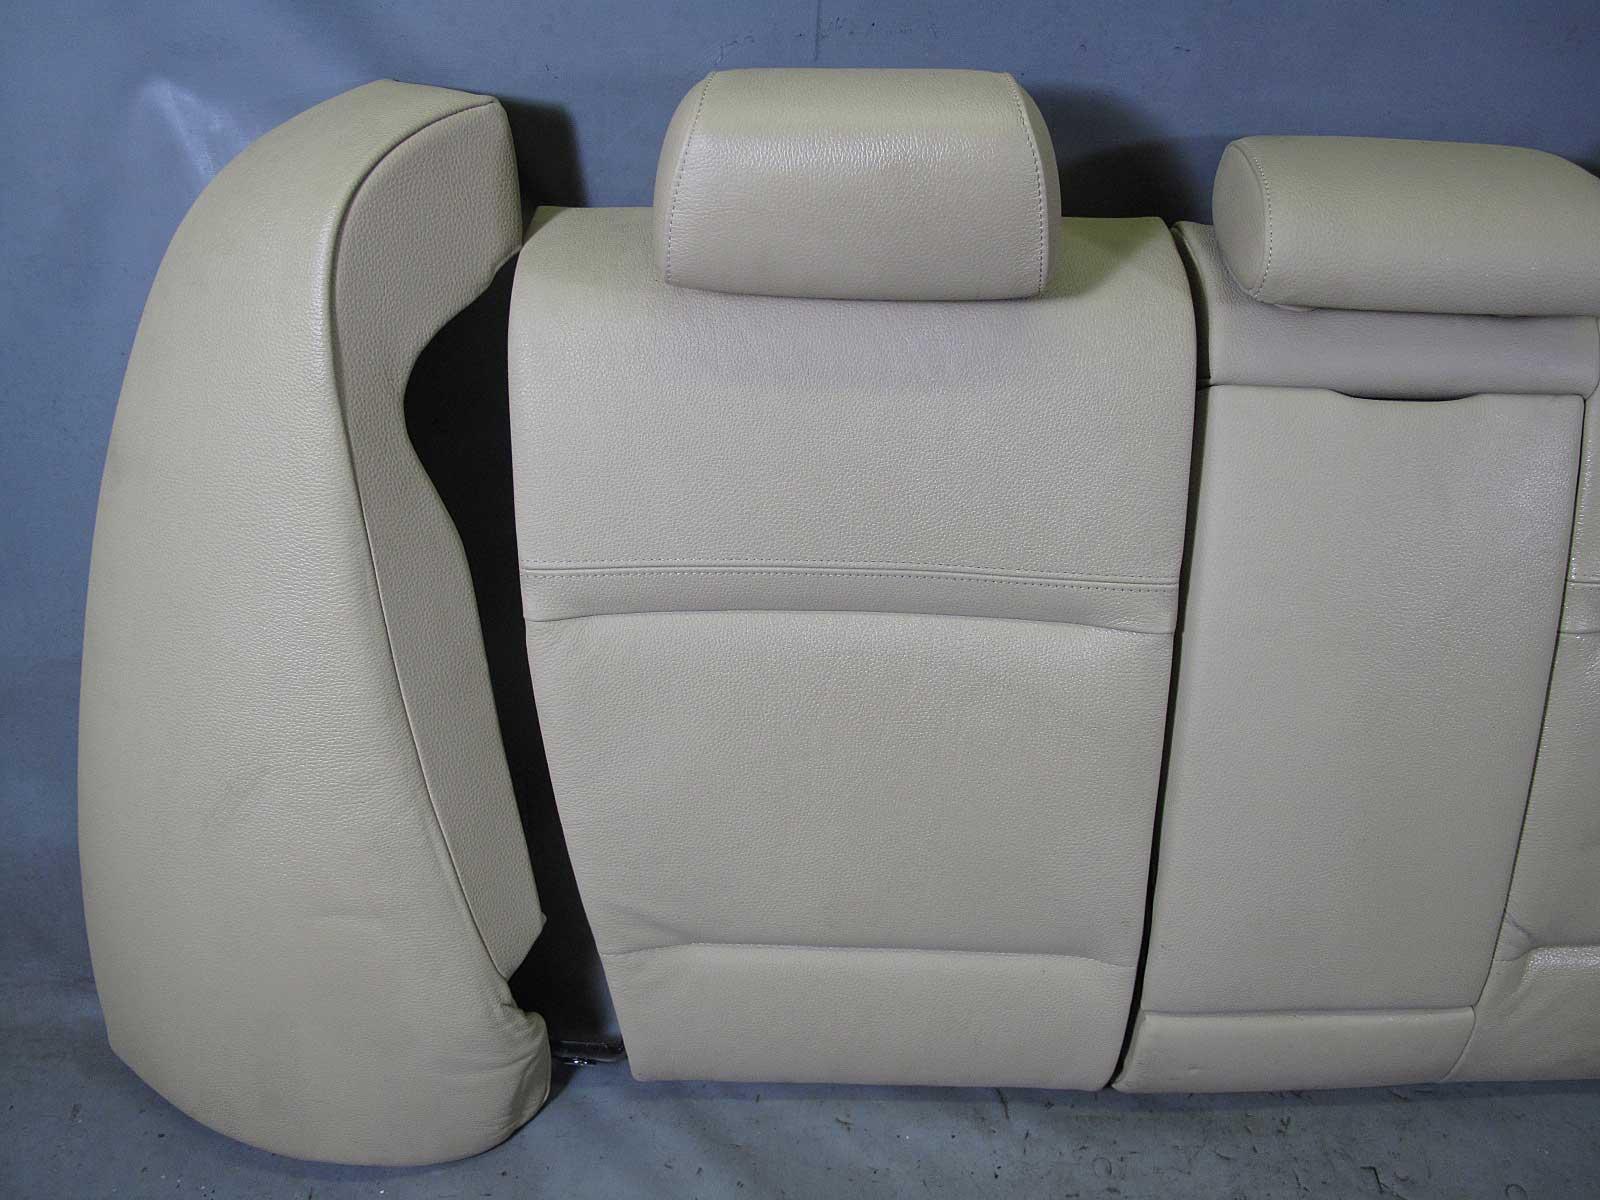 bmw e90 3 series lci sedan rear folding seat backrest. Black Bedroom Furniture Sets. Home Design Ideas